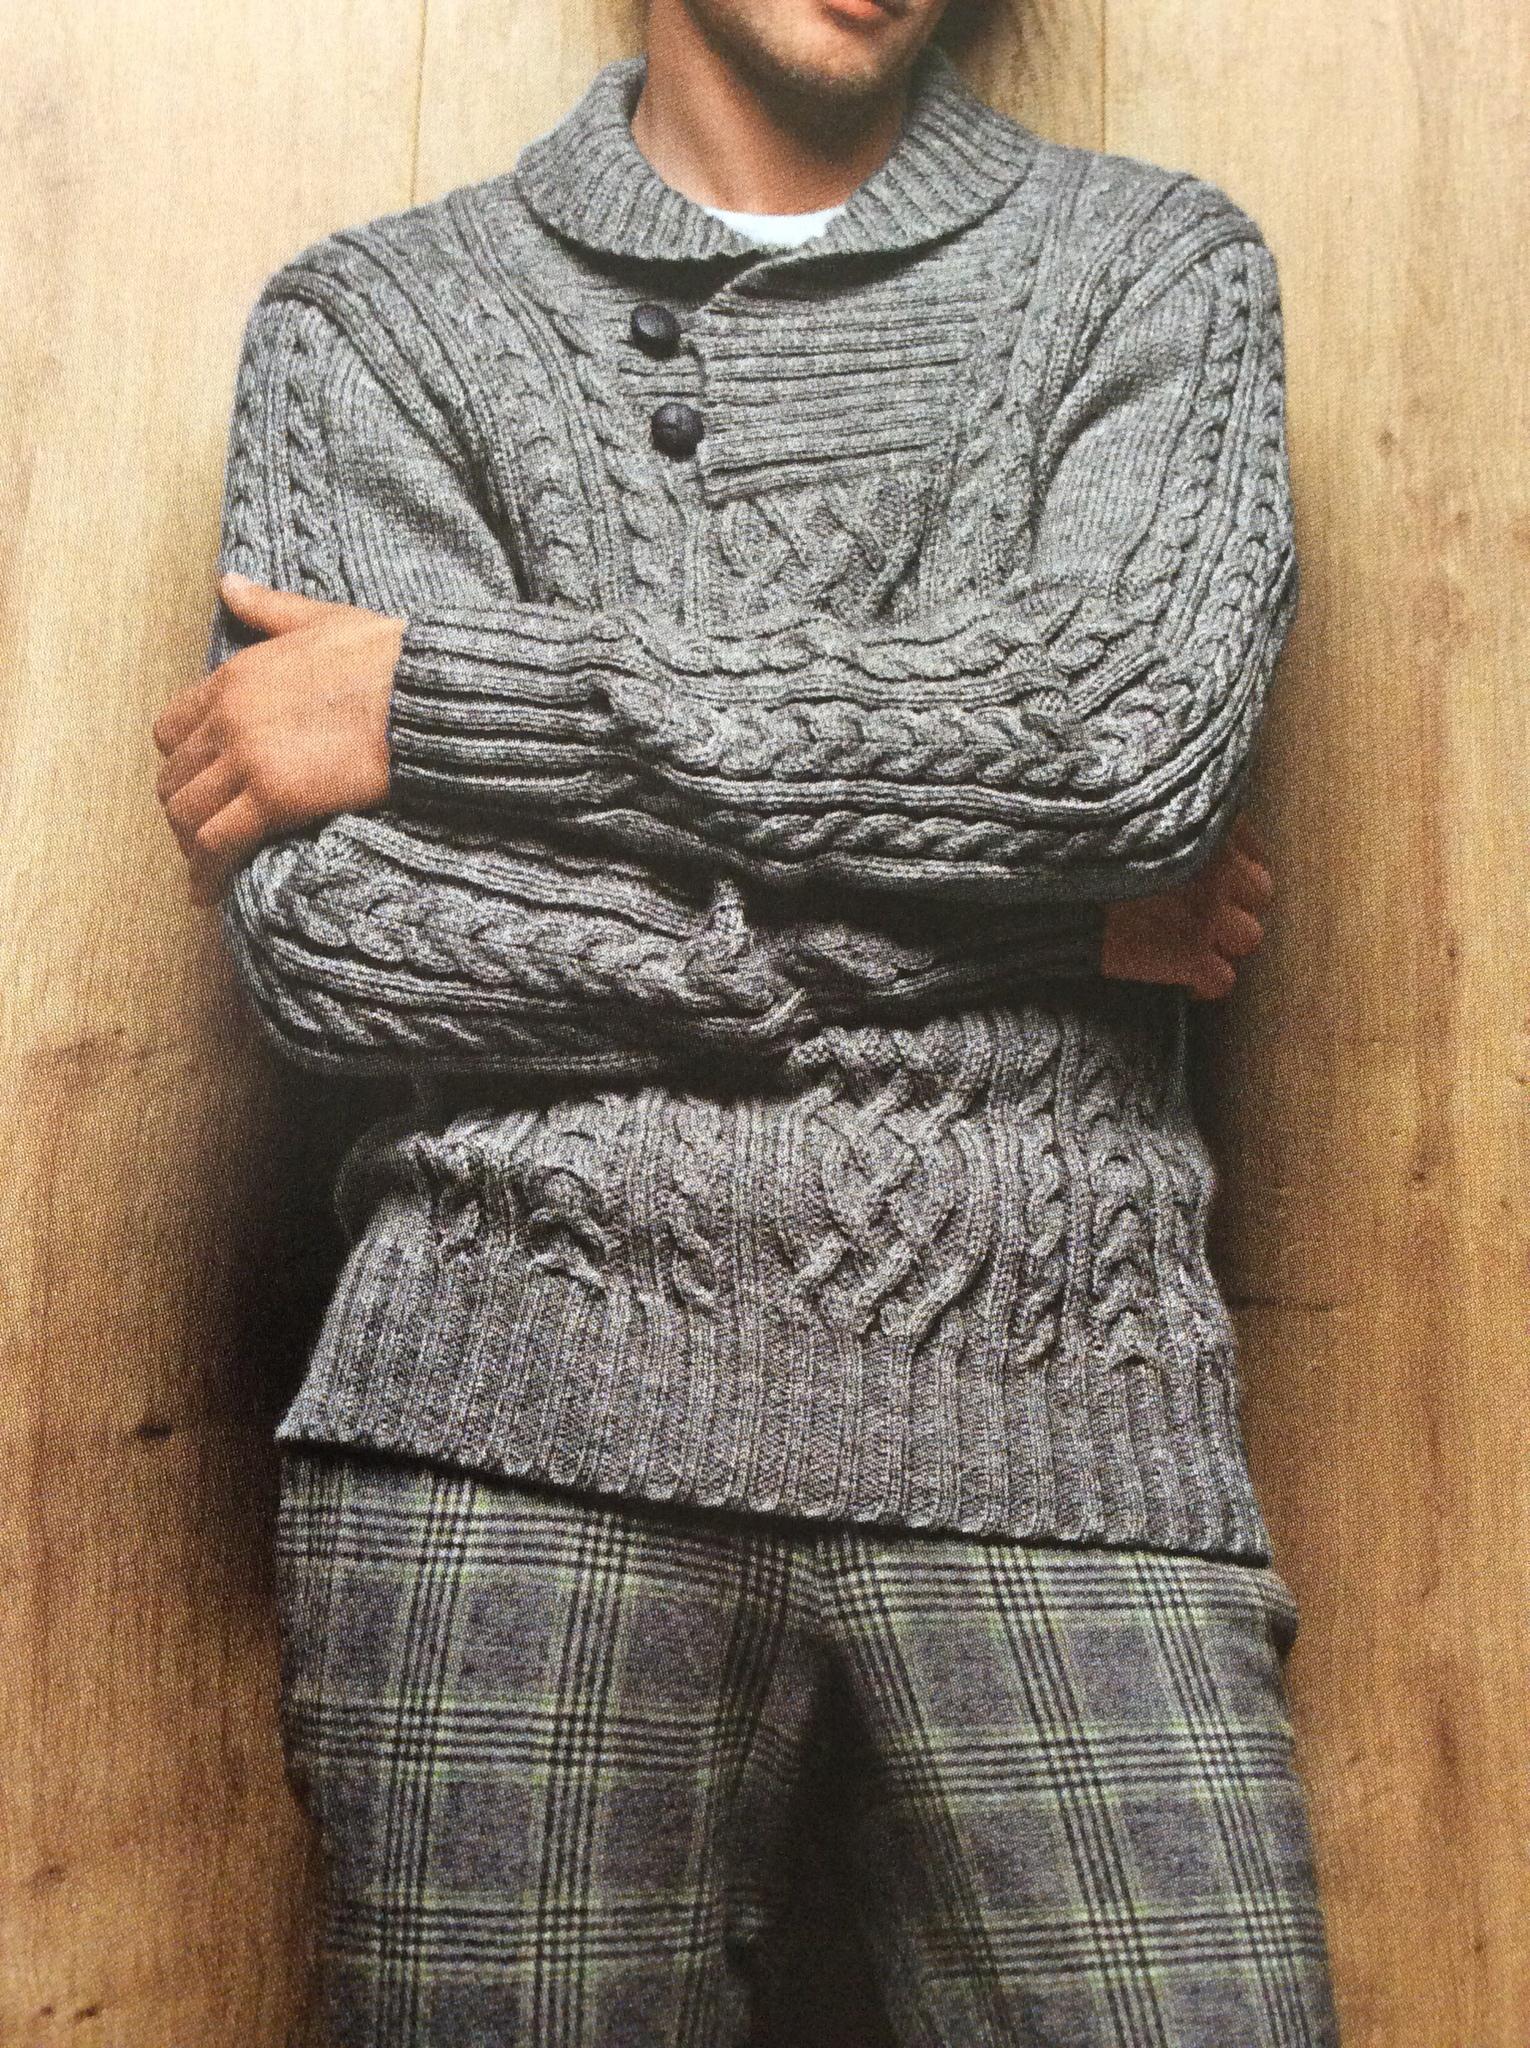 Modele tricot homme aiguille 5